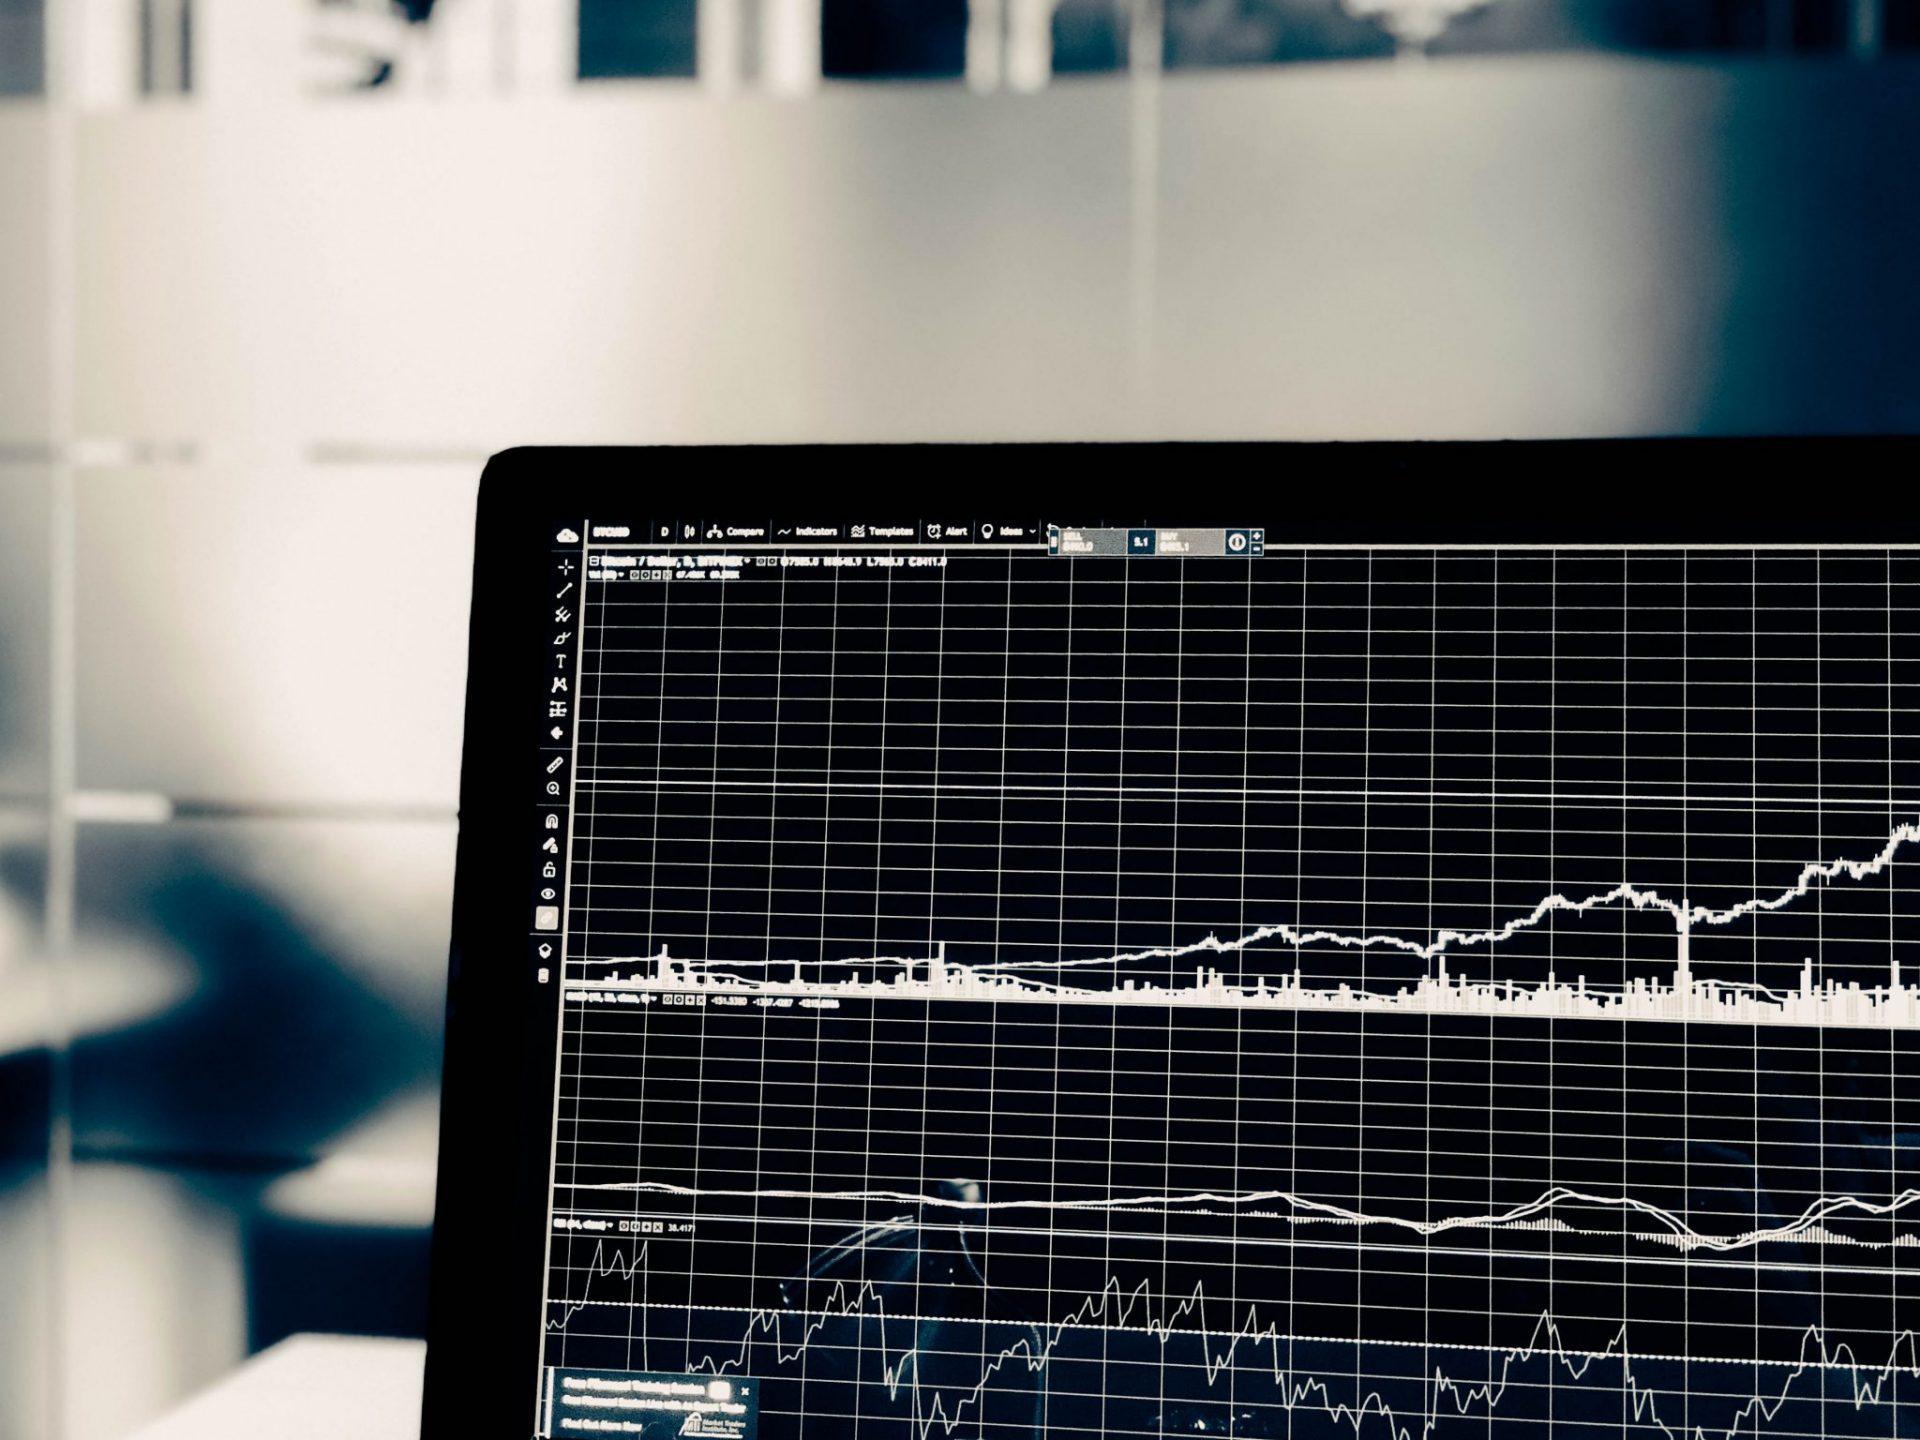 sales statistics building can mislead